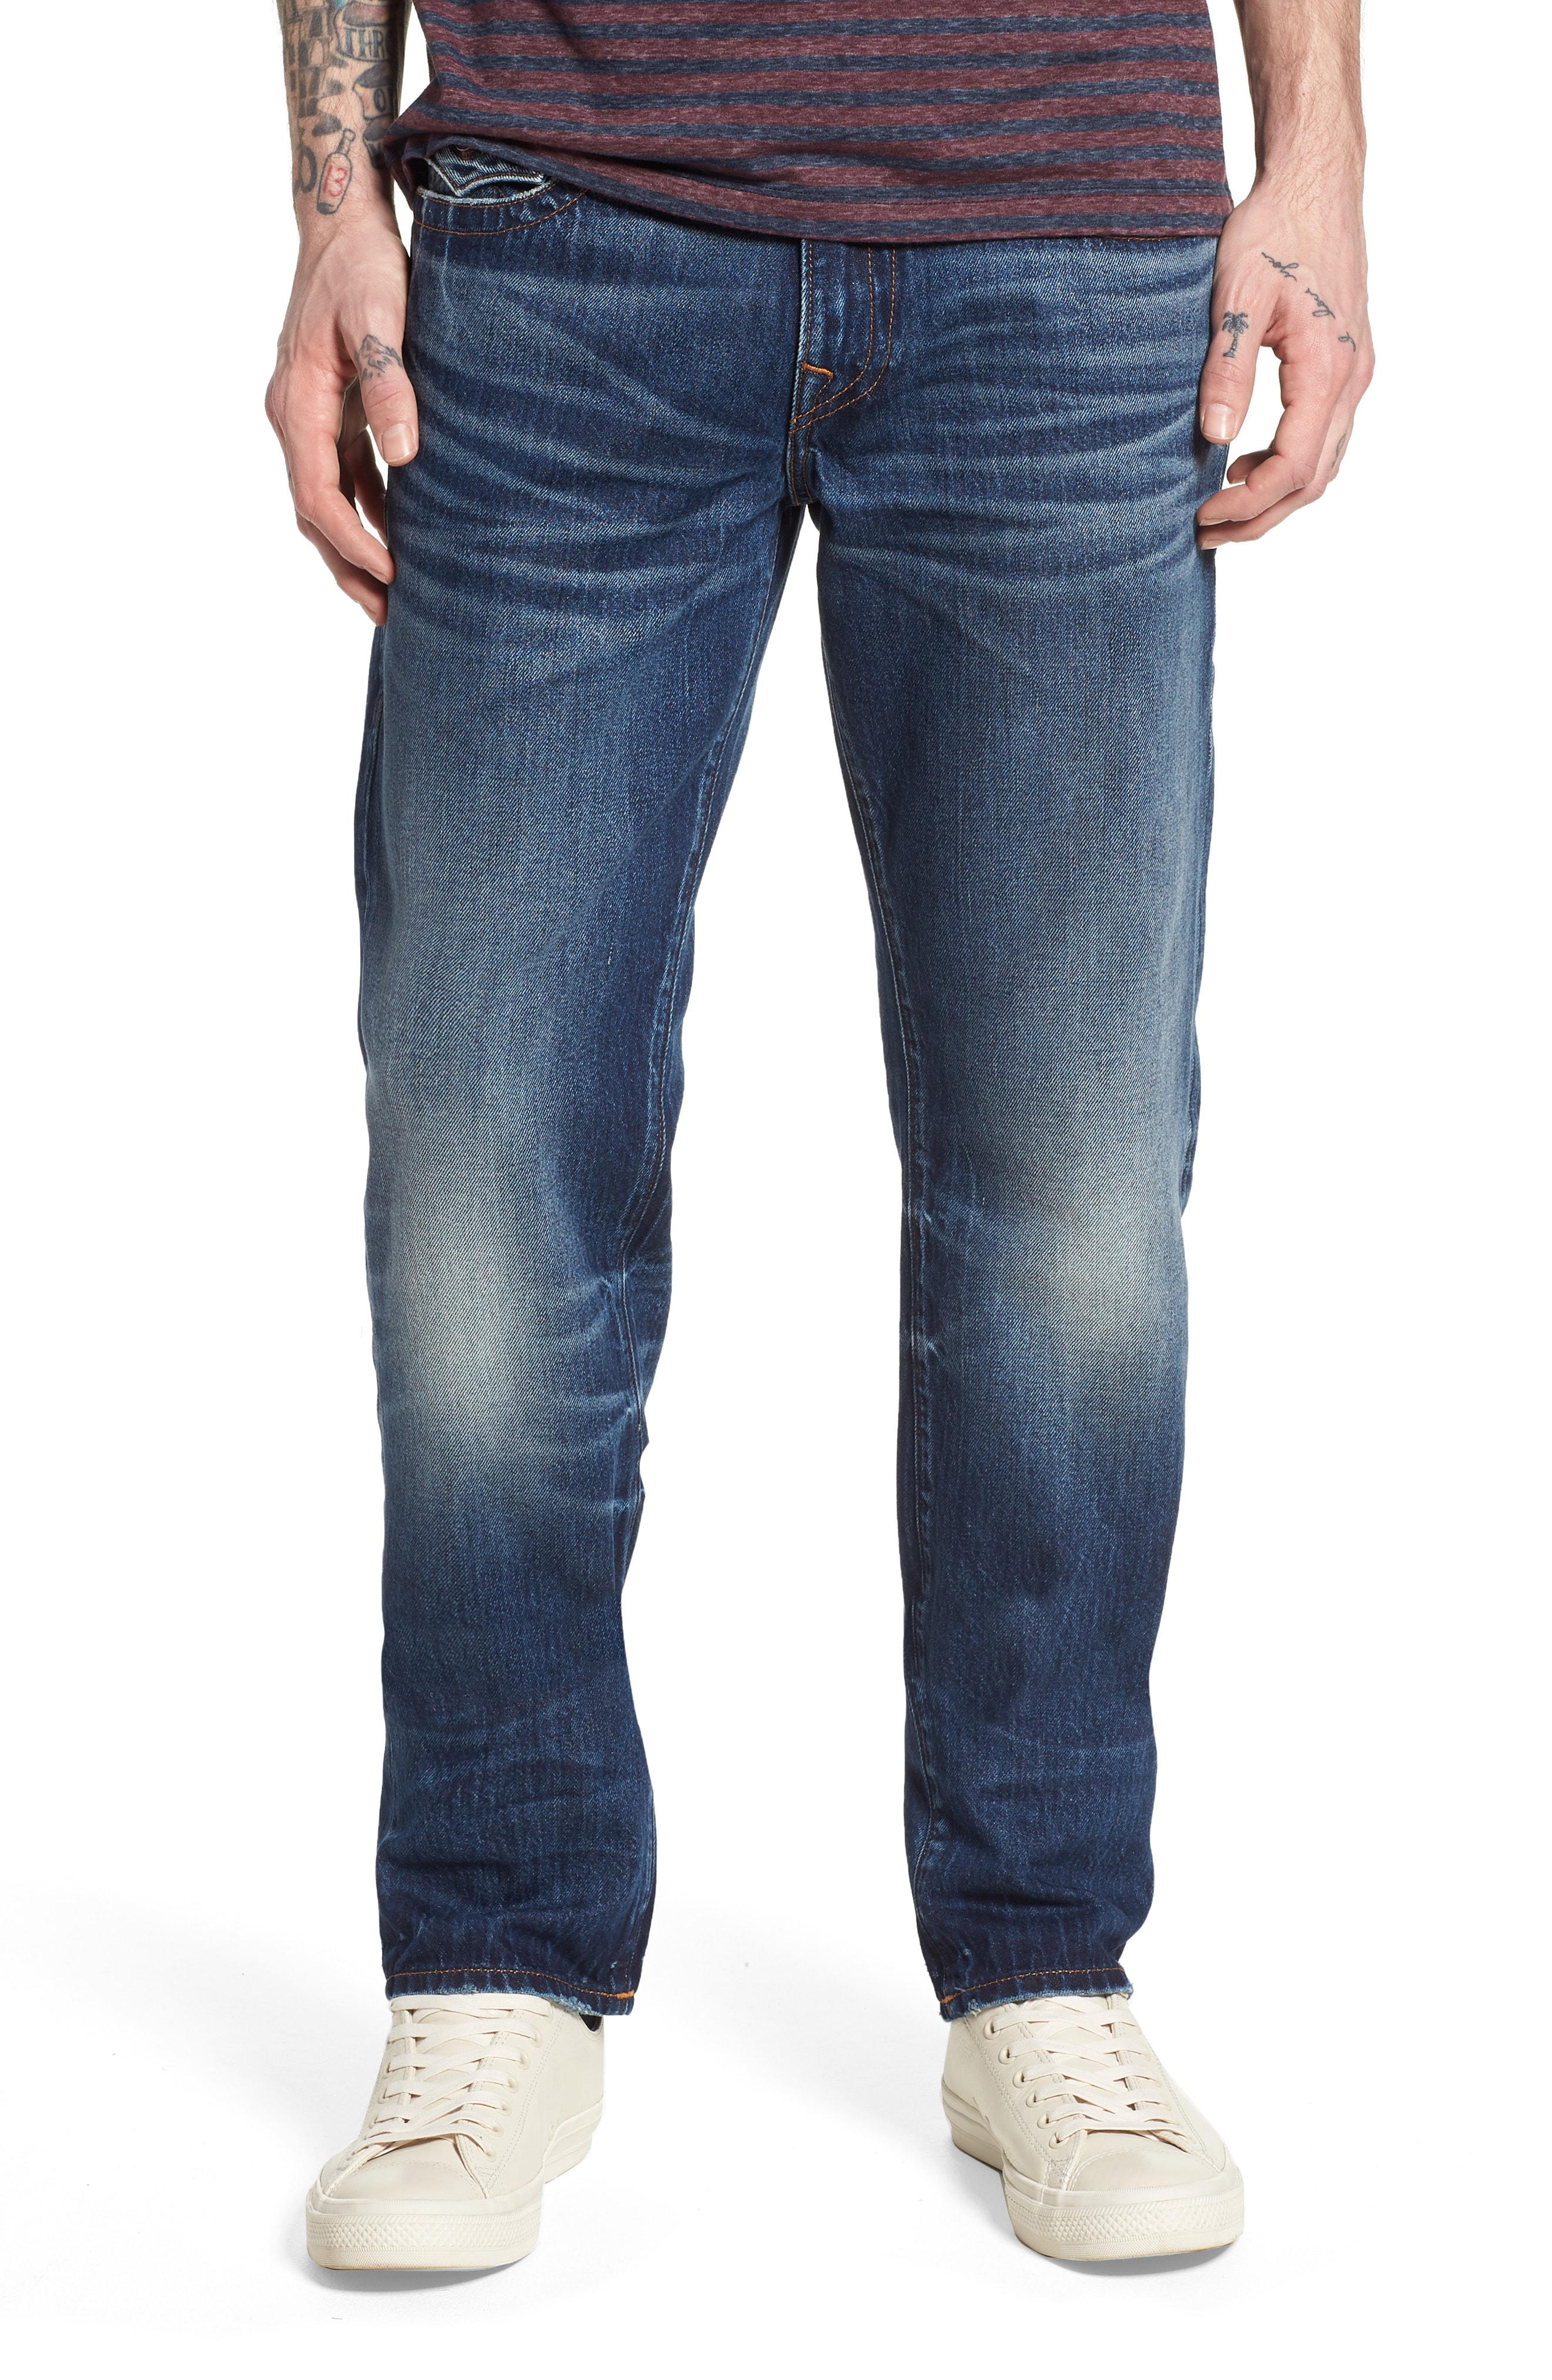 True Religion Brand Jeans Geno Straight Leg Jeans (Dark After Hours)